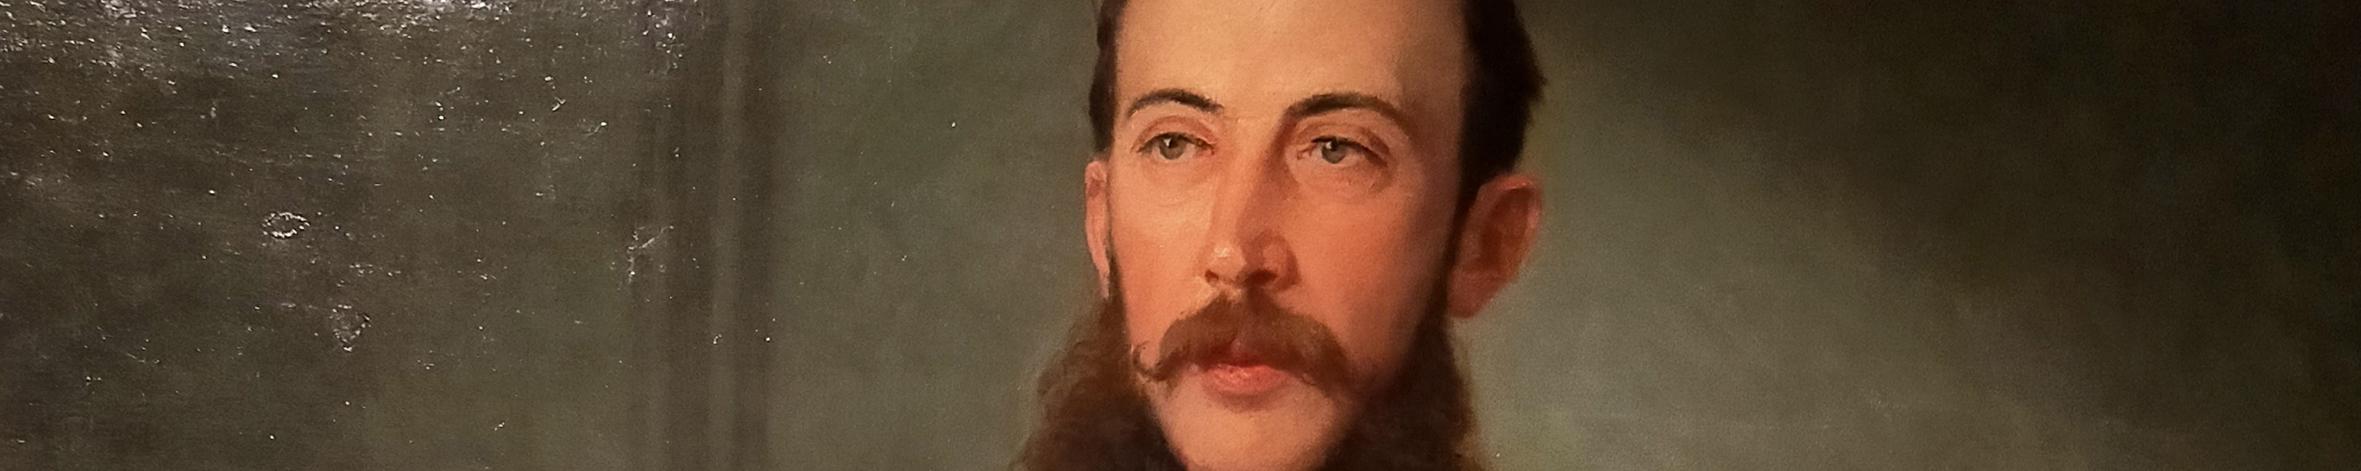 Nuestro patrimonio: Retrato de Ricardo Balparda Fernández (Juan de Barroeta 1881)